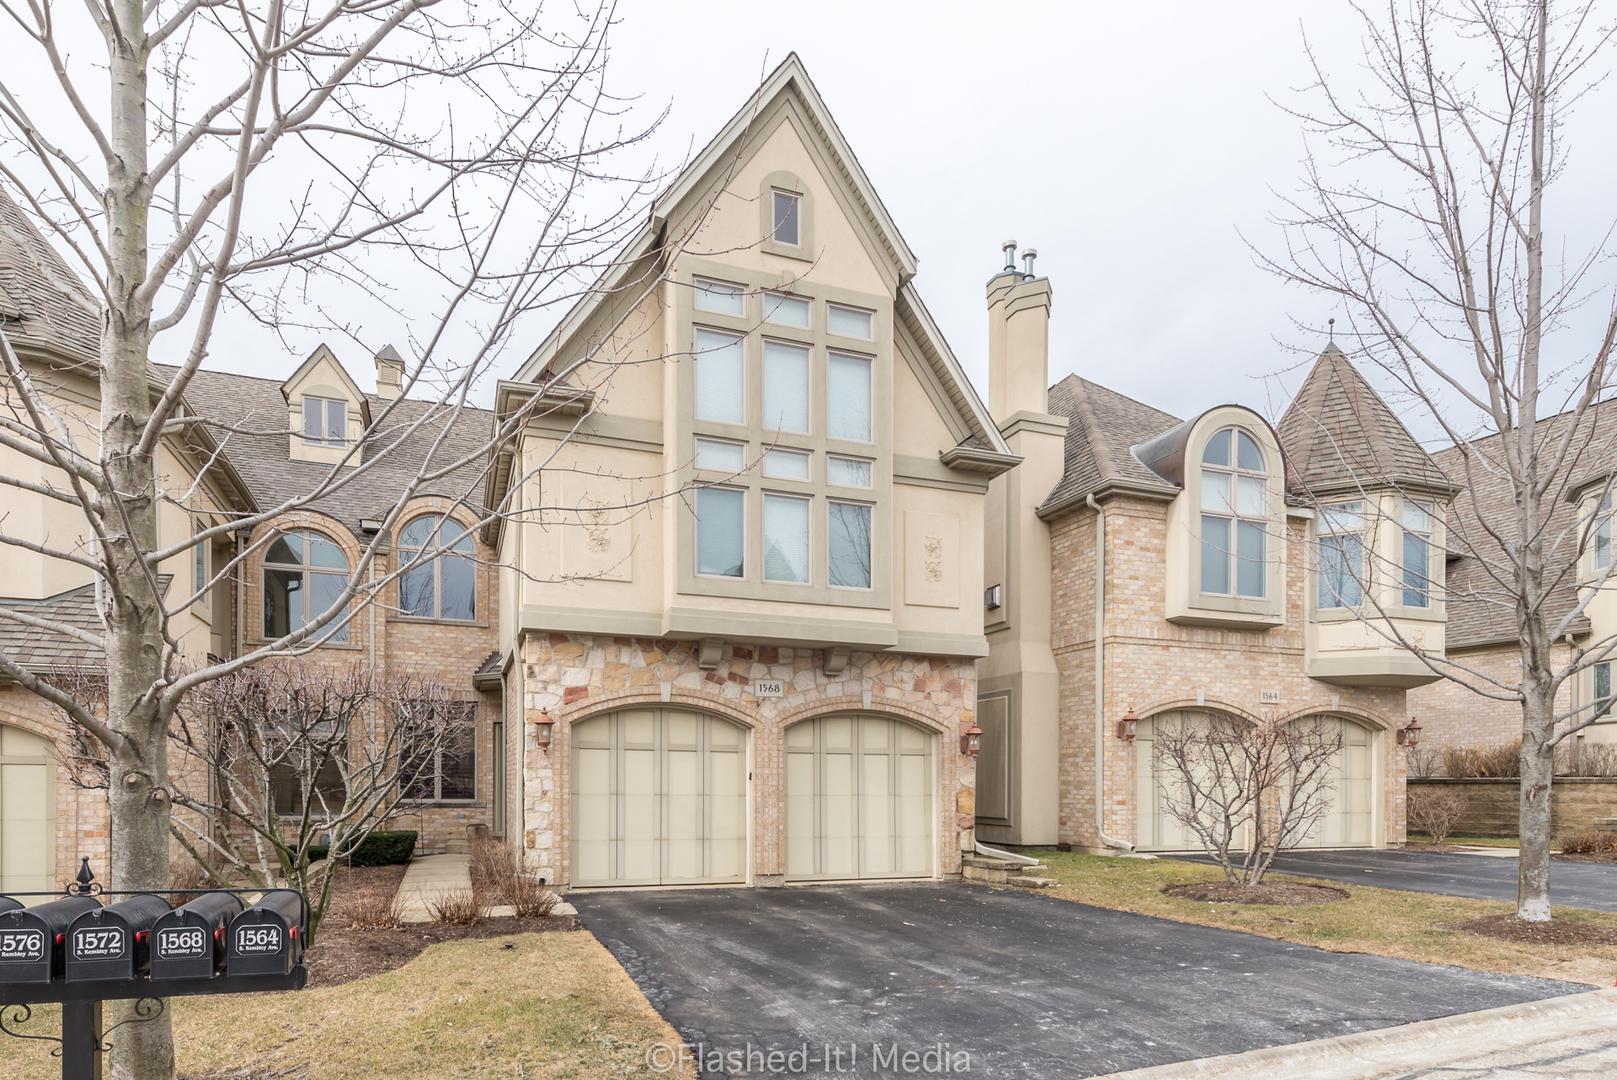 1568 South Kembley Avenue, Palatine, IL 60067